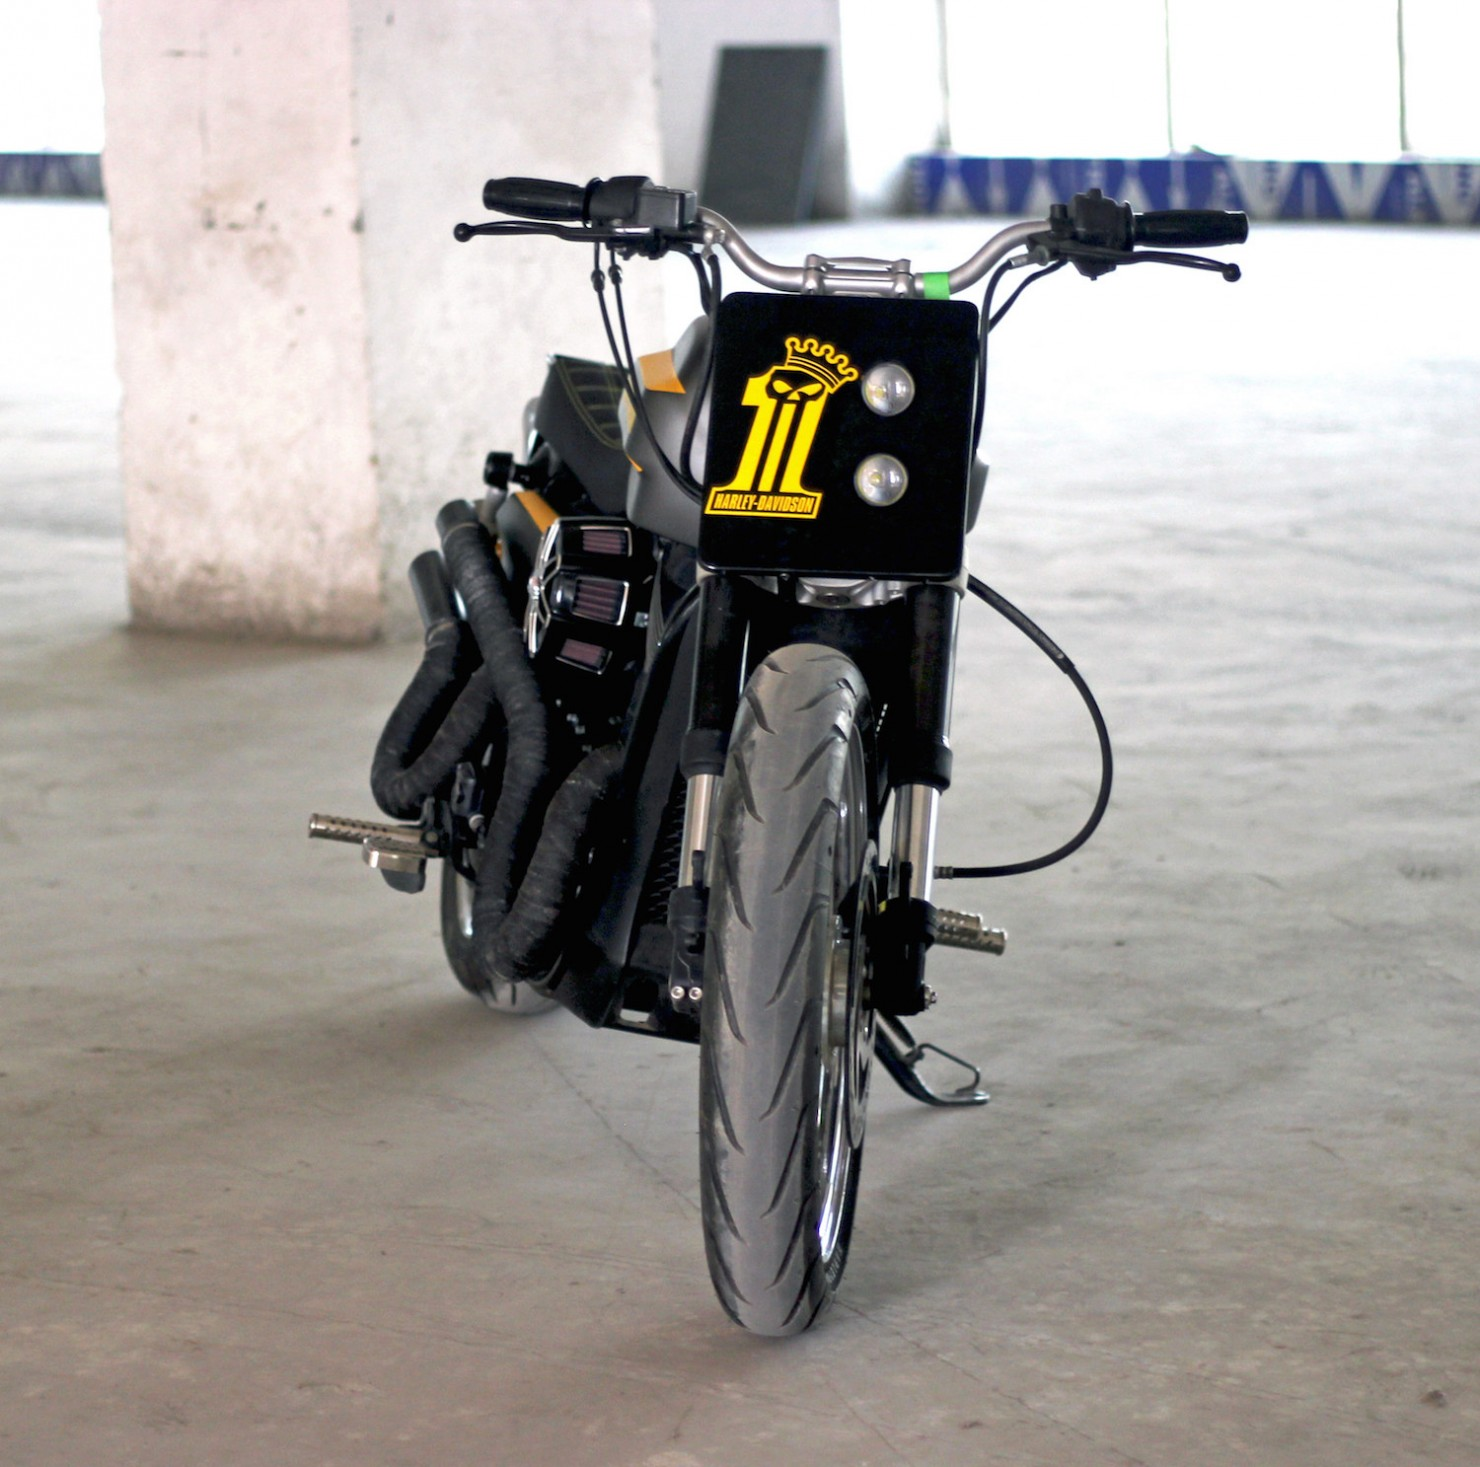 Harley-Davidson-Street-750 4